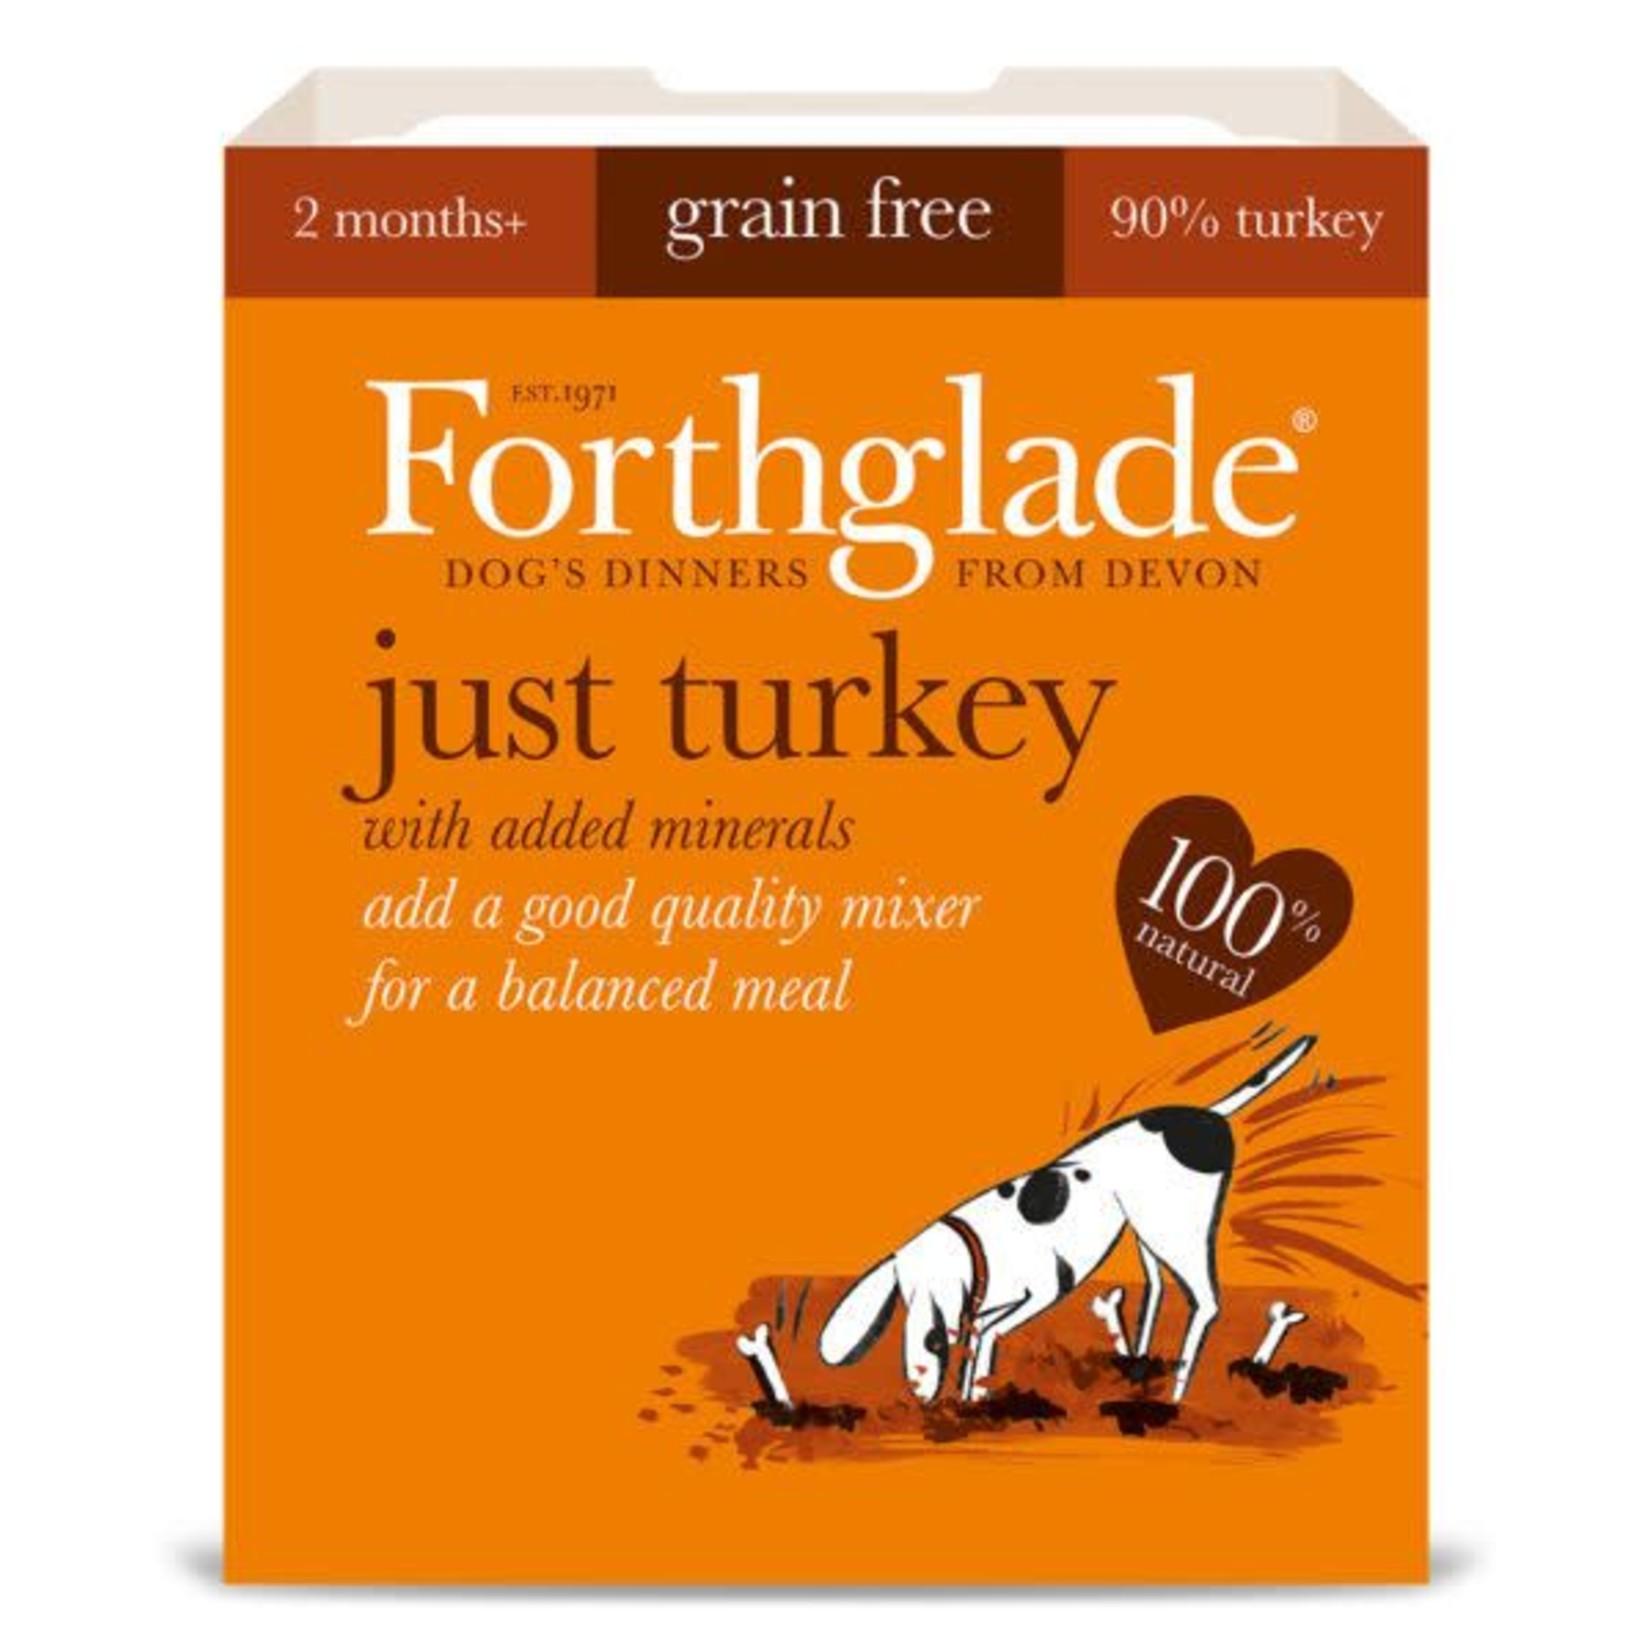 Forthglade Just Turkey Grain Free 2 Months + Wet Dog Food, 395g